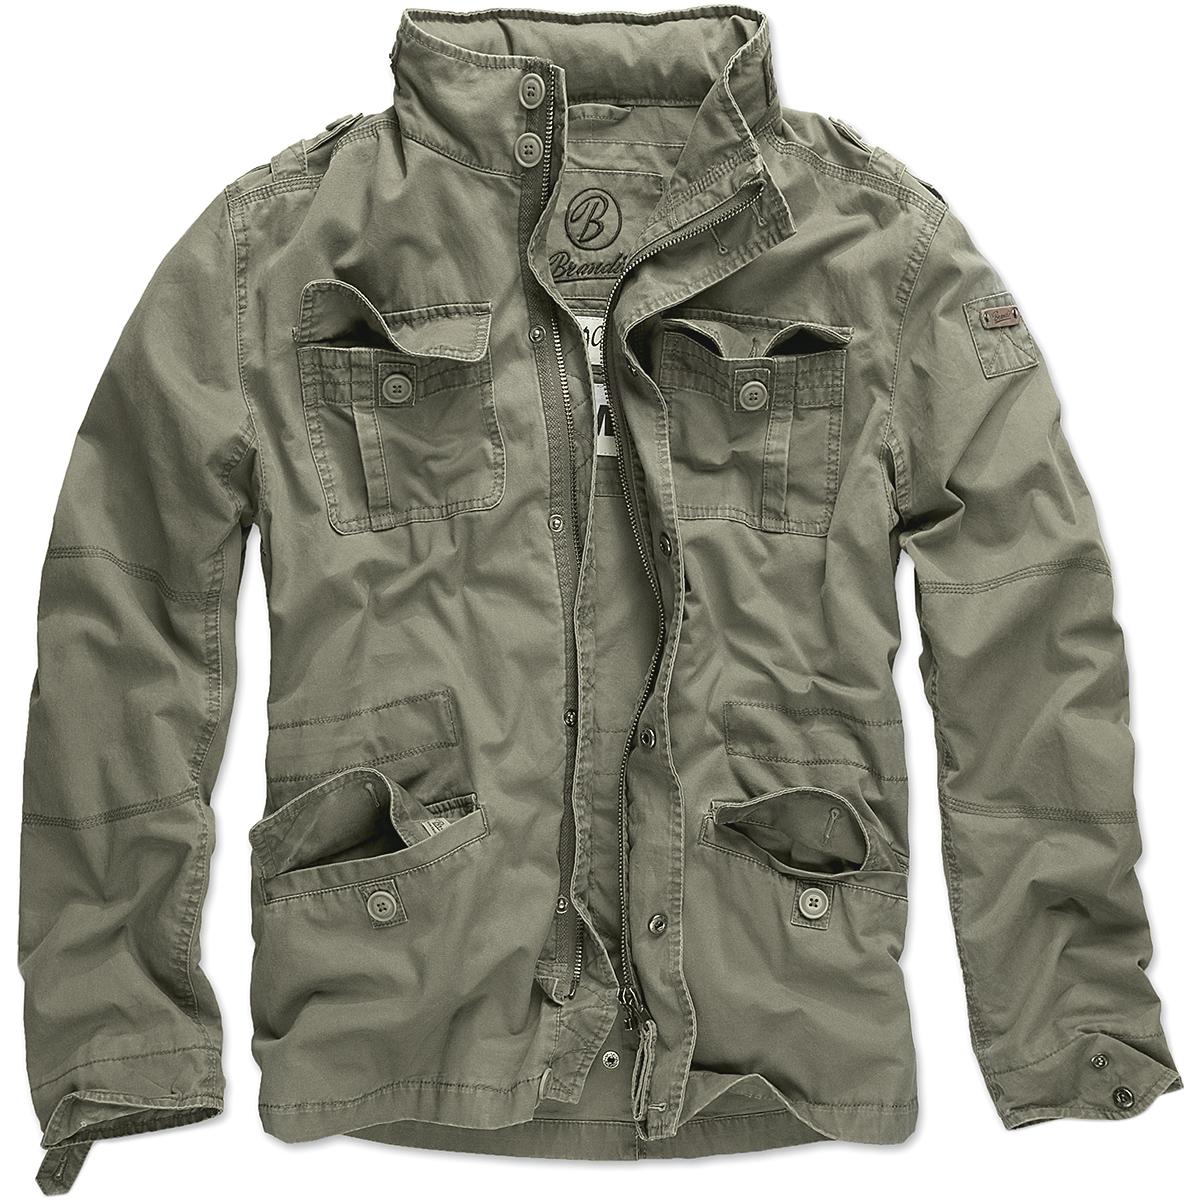 Mens jacket cotton - Brandit Britannia Field Jacket Warm Hiking Coat Mens